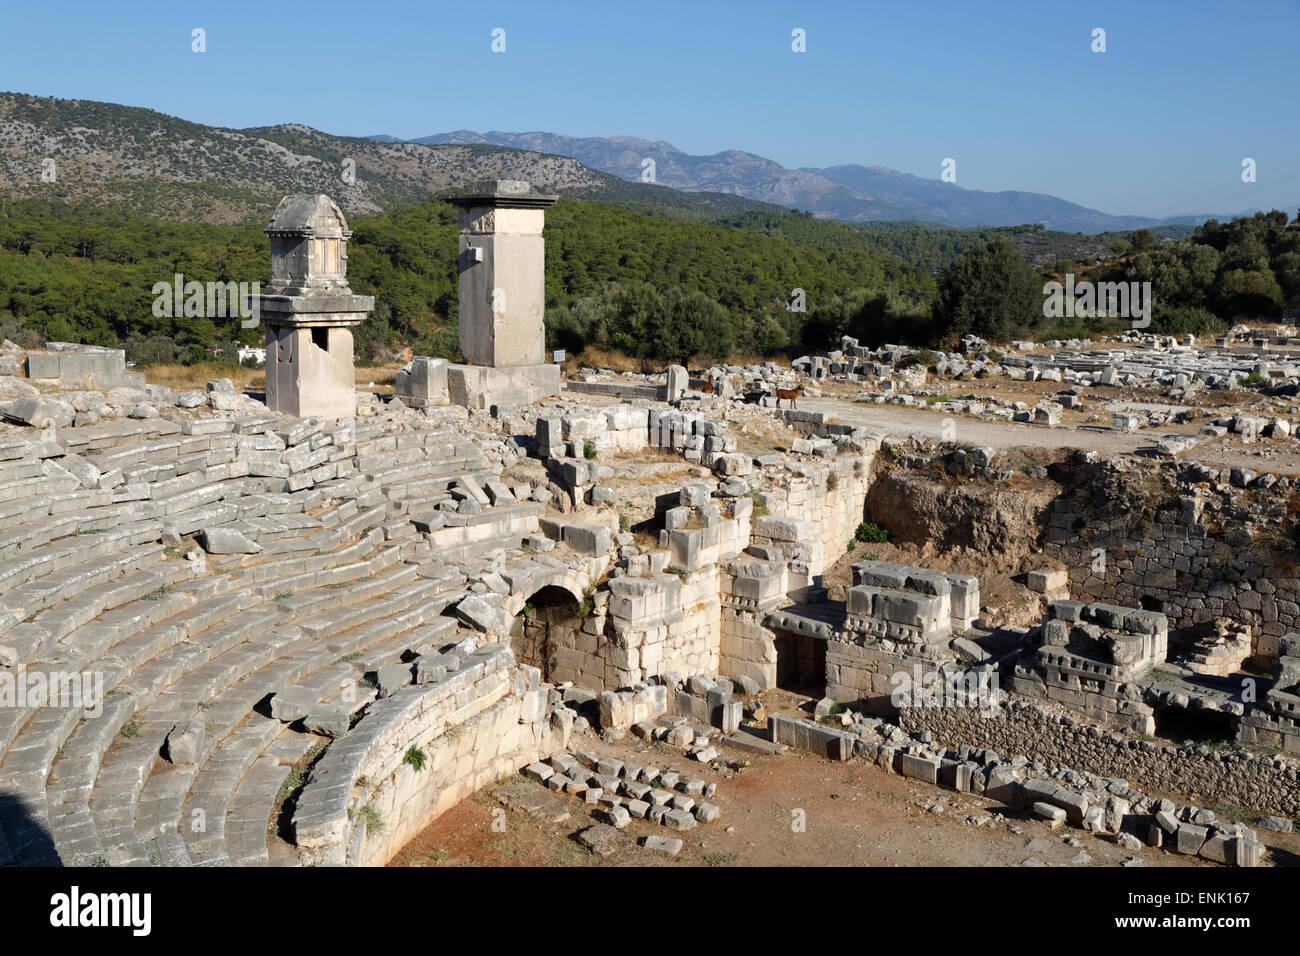 Amphitheatre and Harpy monument, Xanthos, Kalkan, Lycia, Antalya Province, Southwest Turkey, Anatolia, Turkey - Stock Image